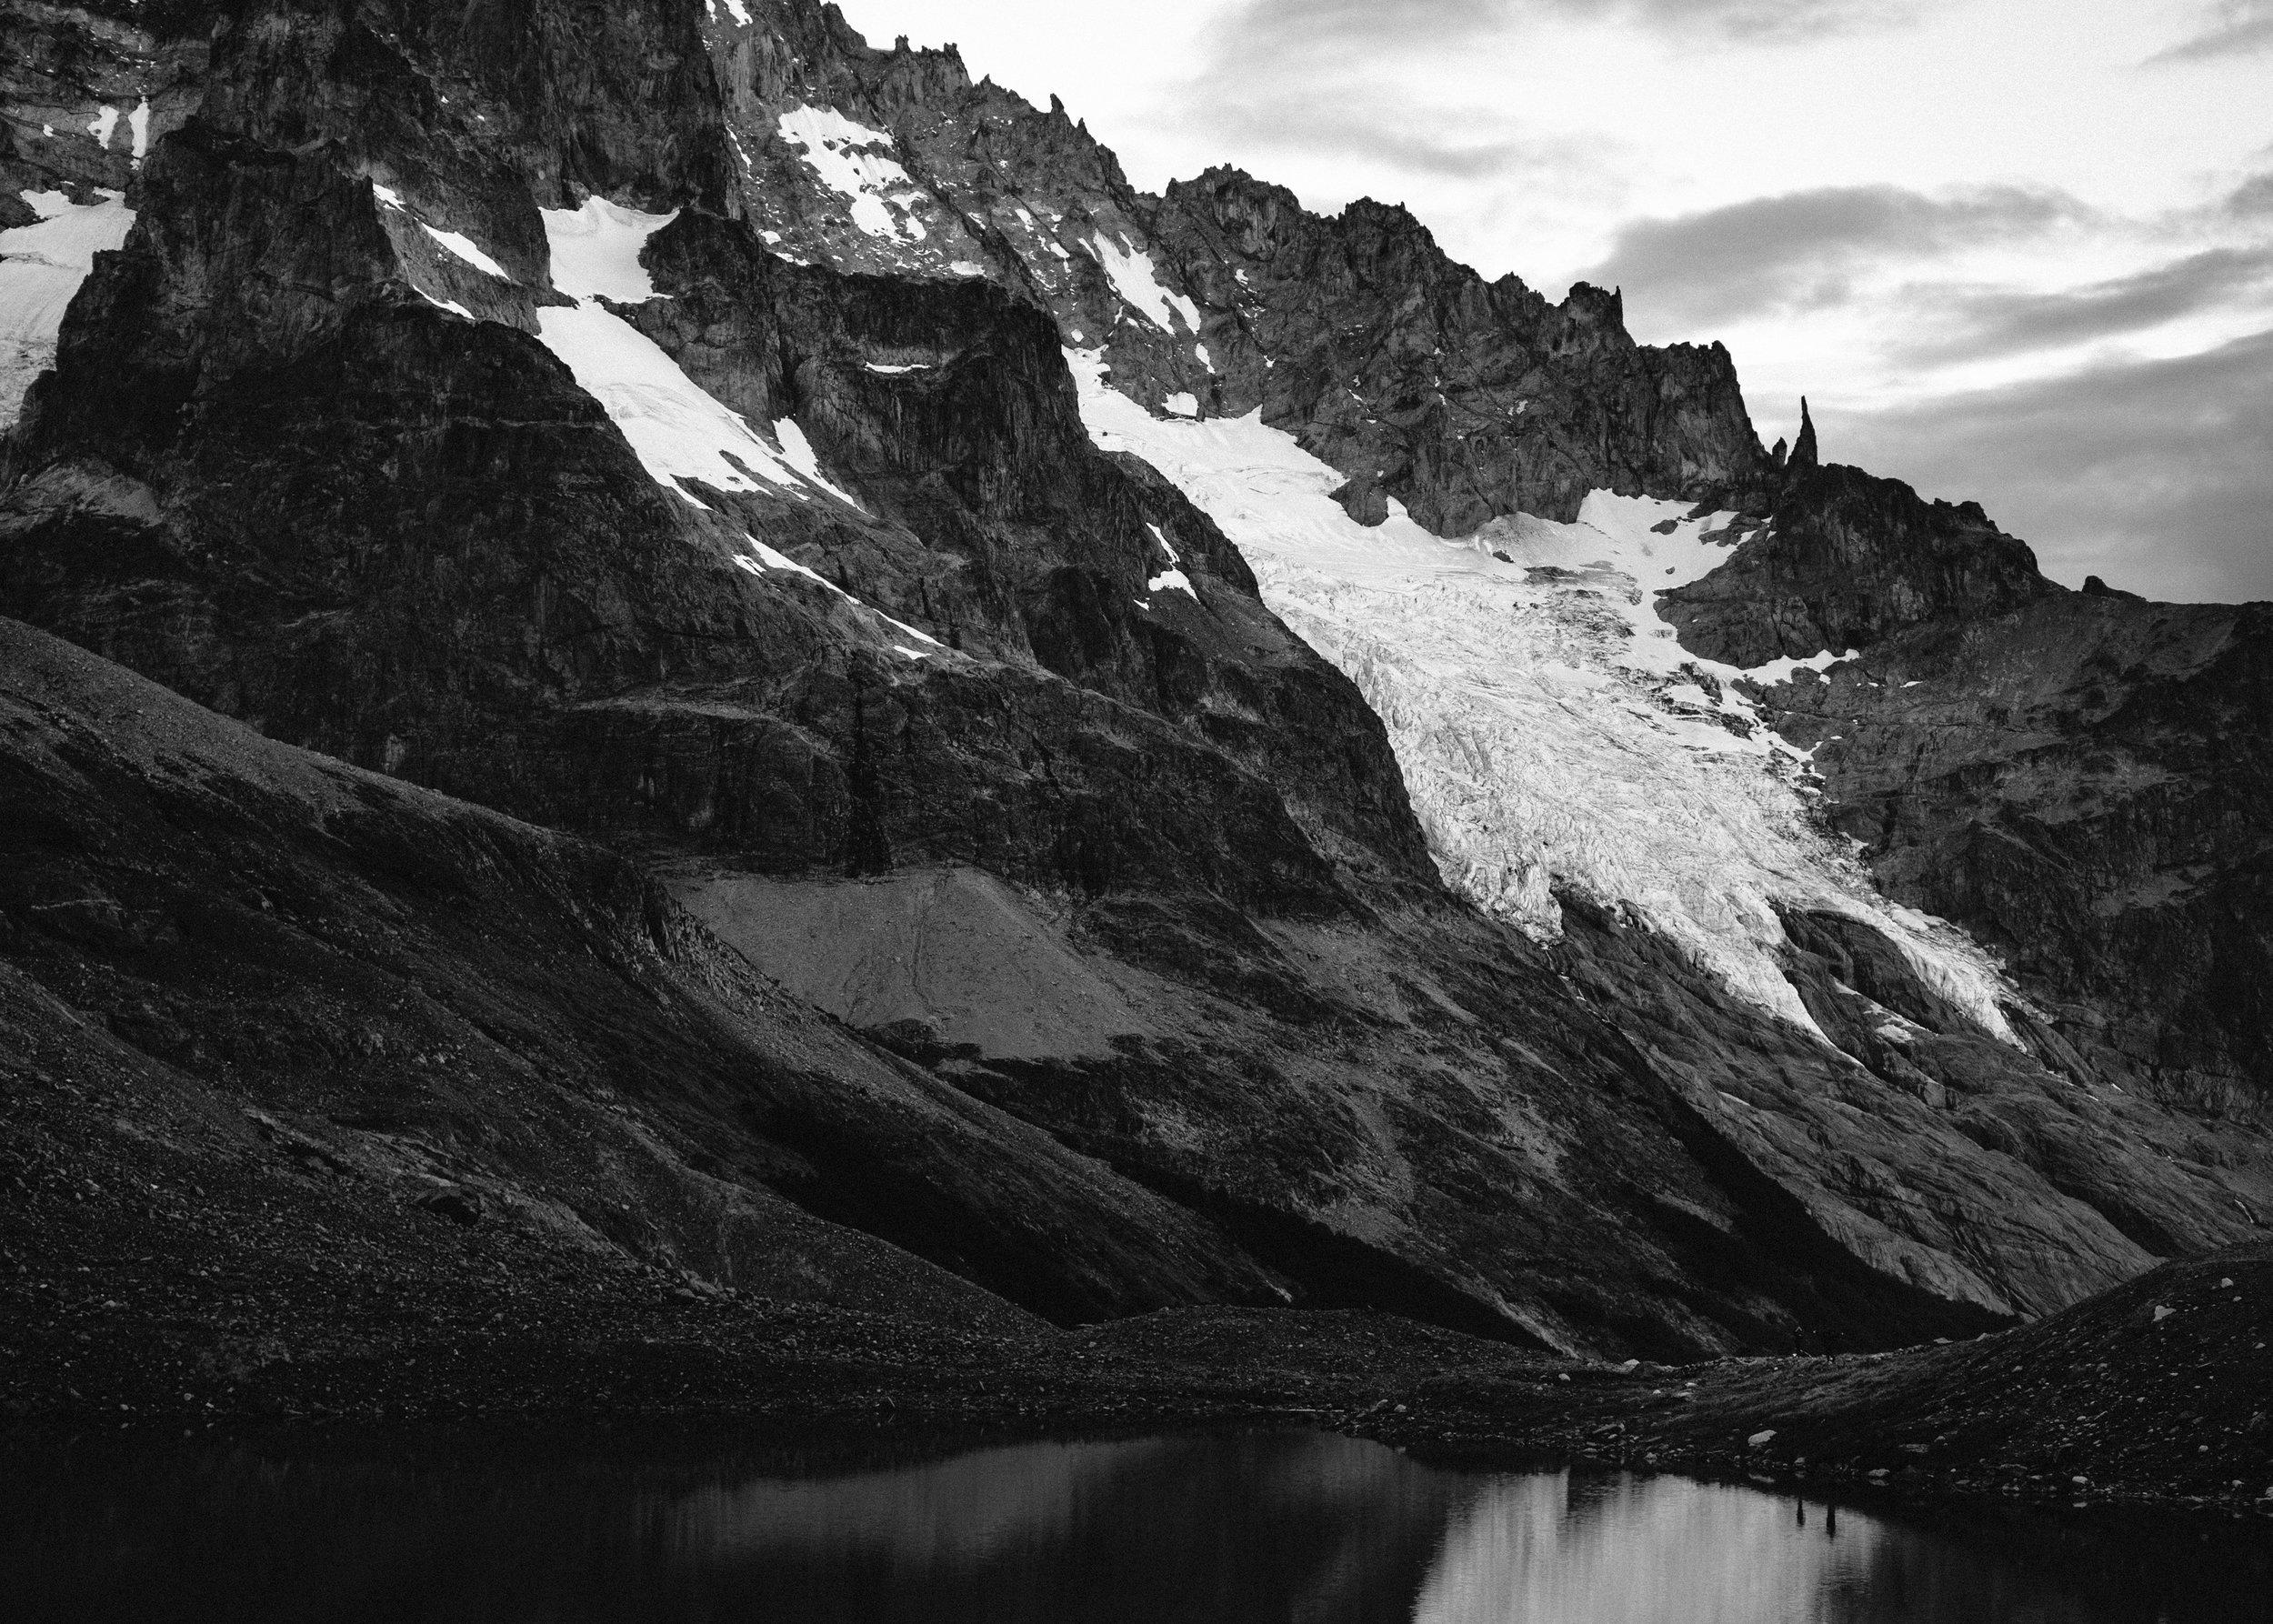 20190301_Patagonia_16.jpg